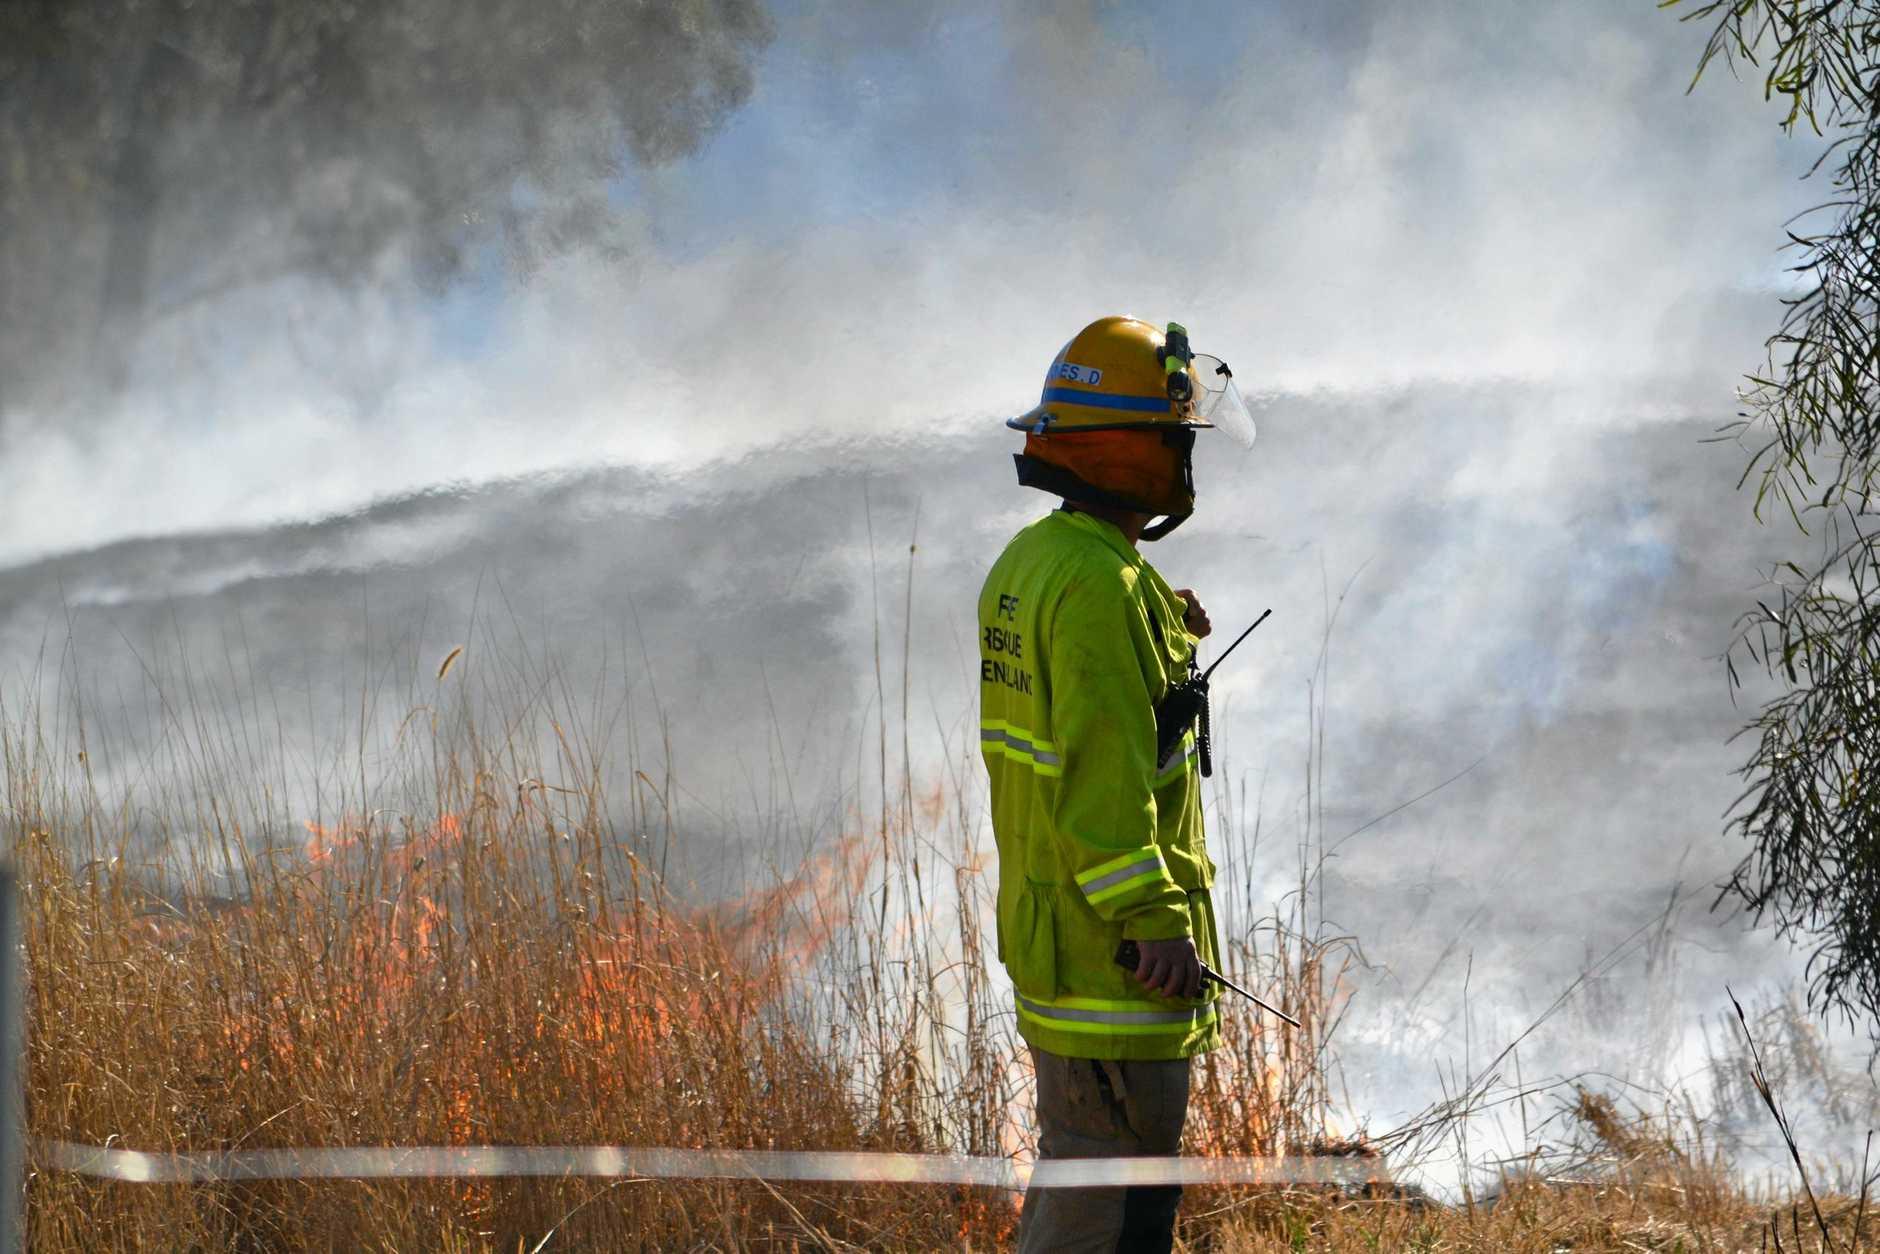 CALL TO VOLUNTEER: Gladstone Rural Fire Service is looking for volunteers.